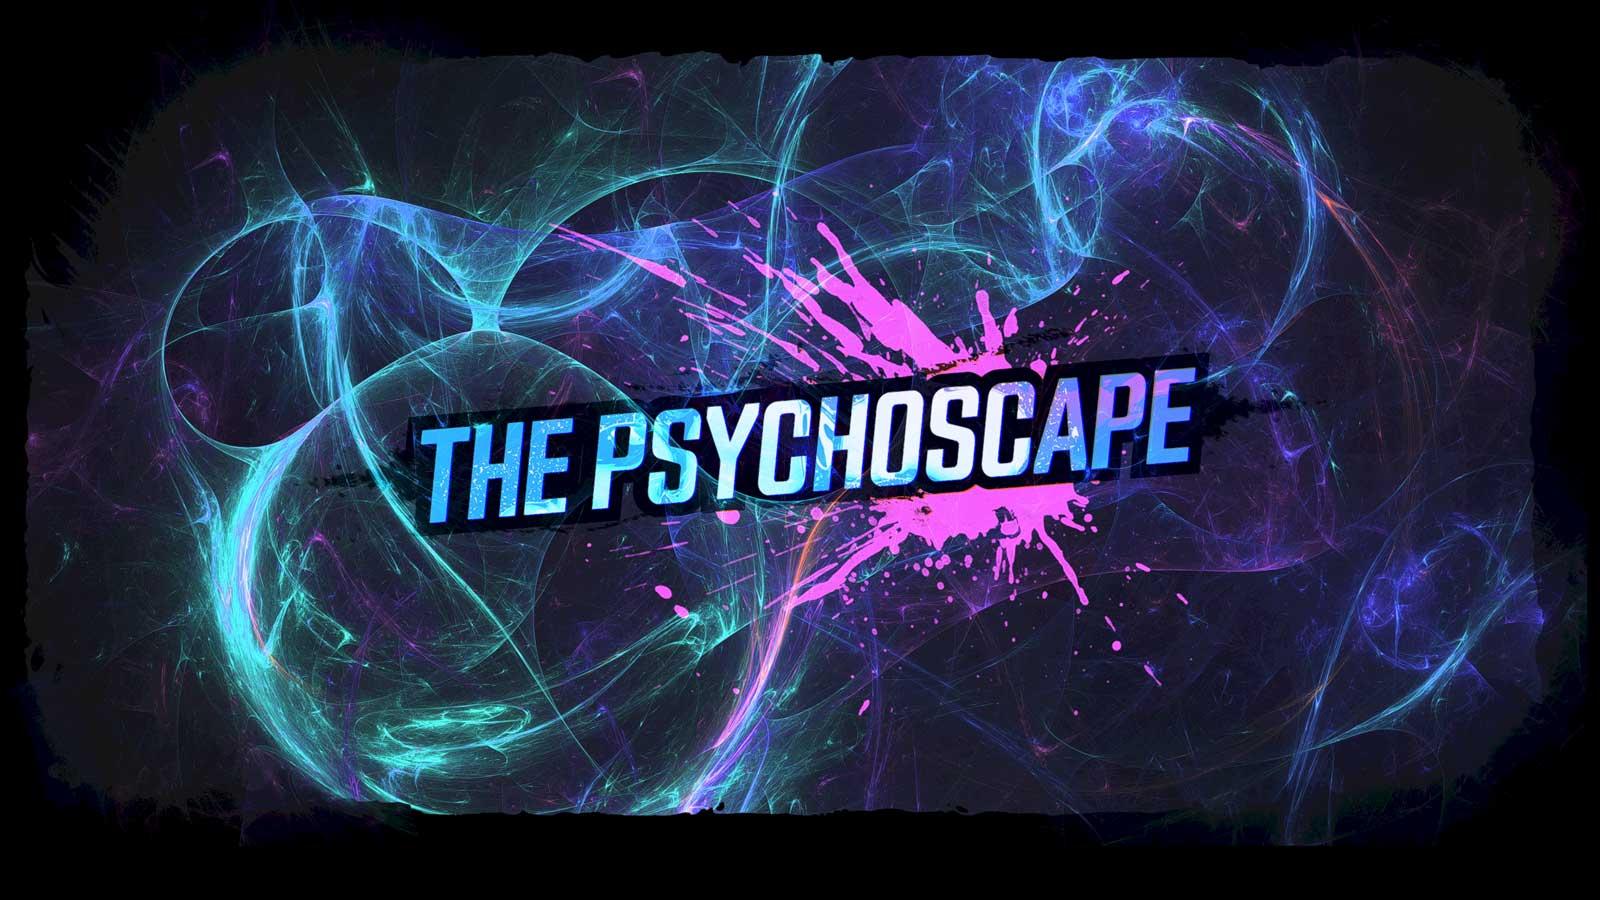 The Psychoscape